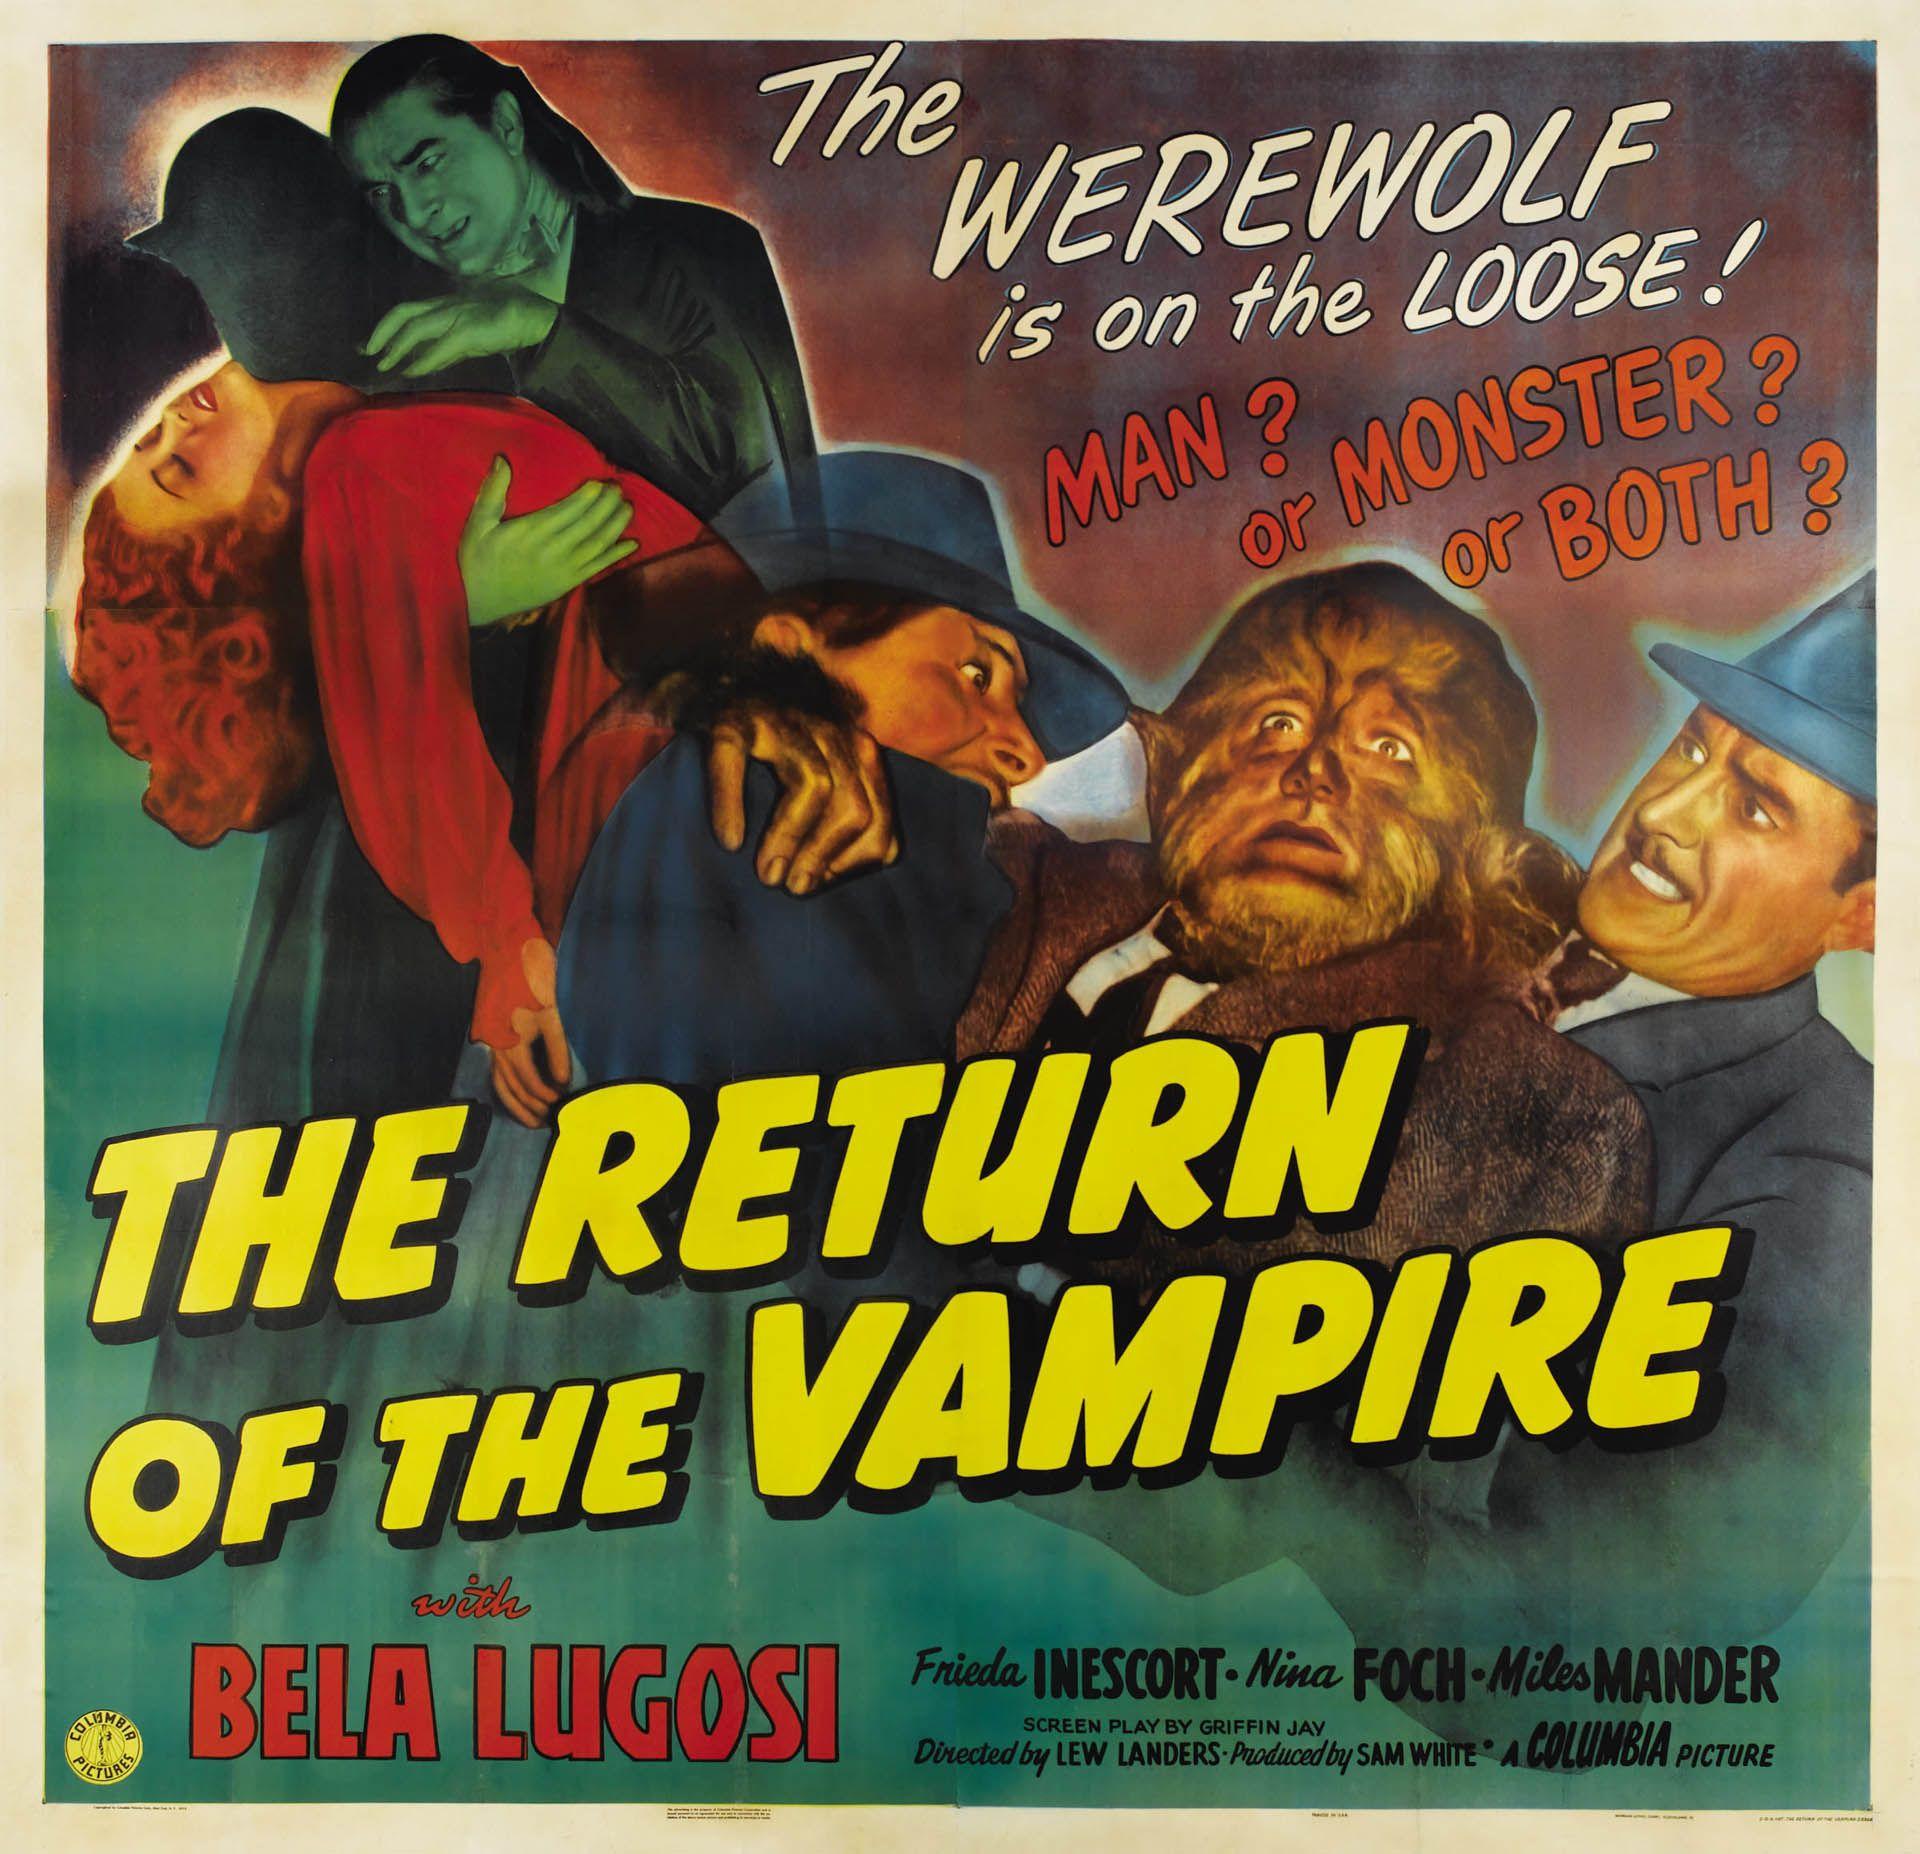 The Return Of The Vampire 1944 Vintage 1940s Movie Posters Wallpaper Image Film Posters Vintage Vampire Movies Movie Posters